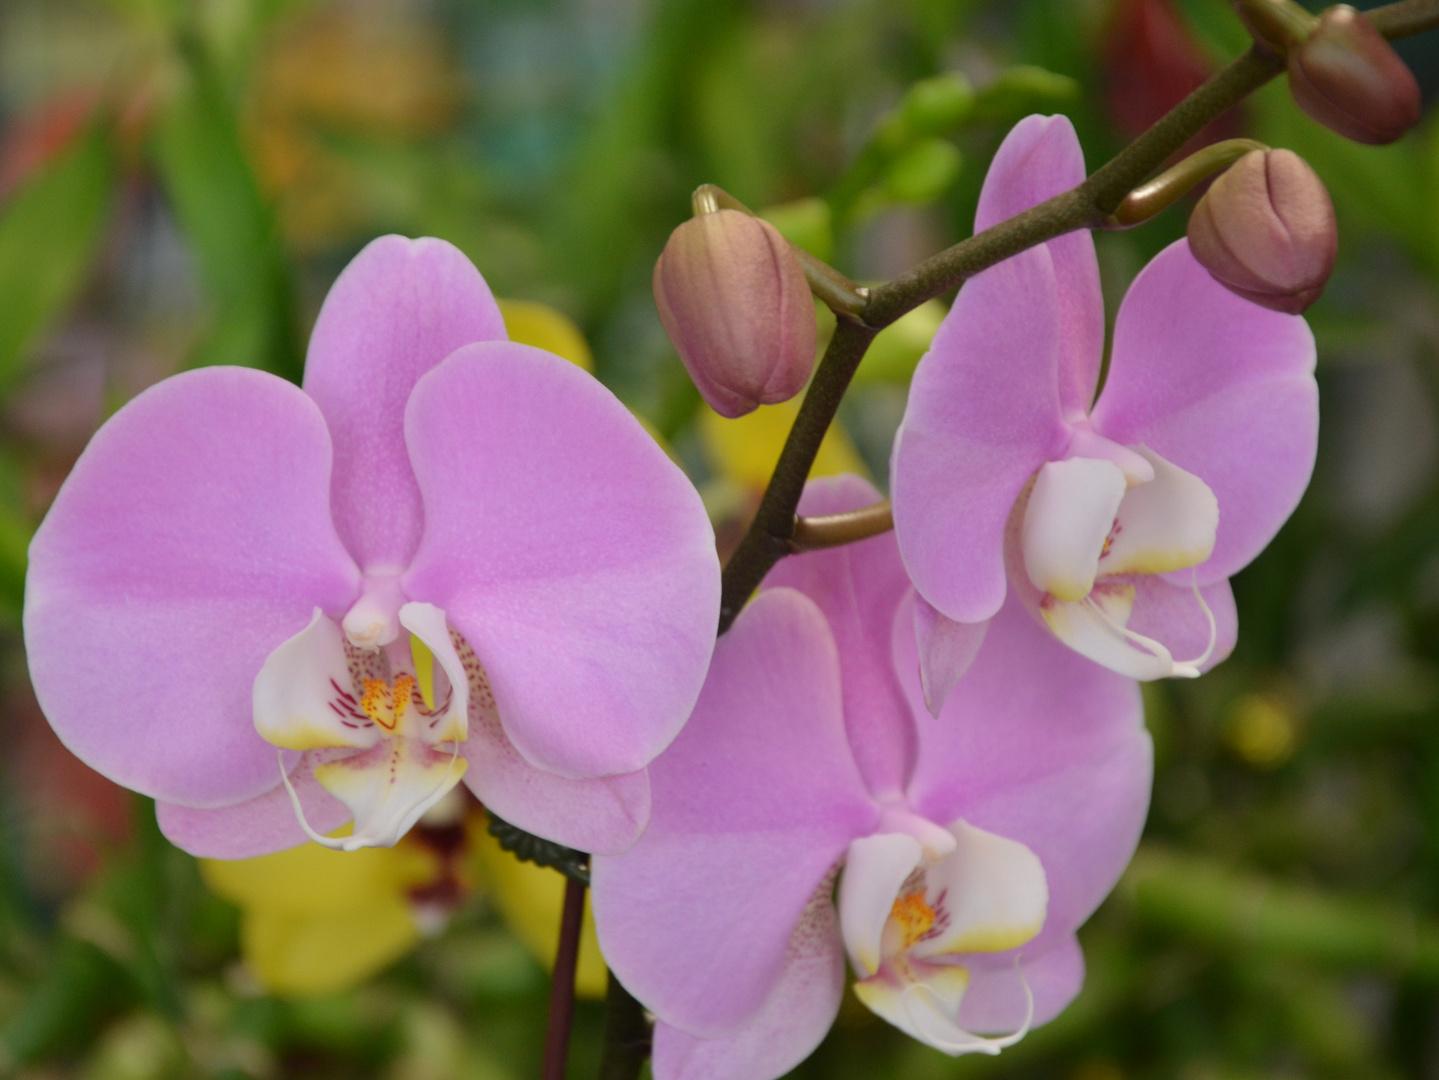 Phanelosis u orquideas Fanelosias lila